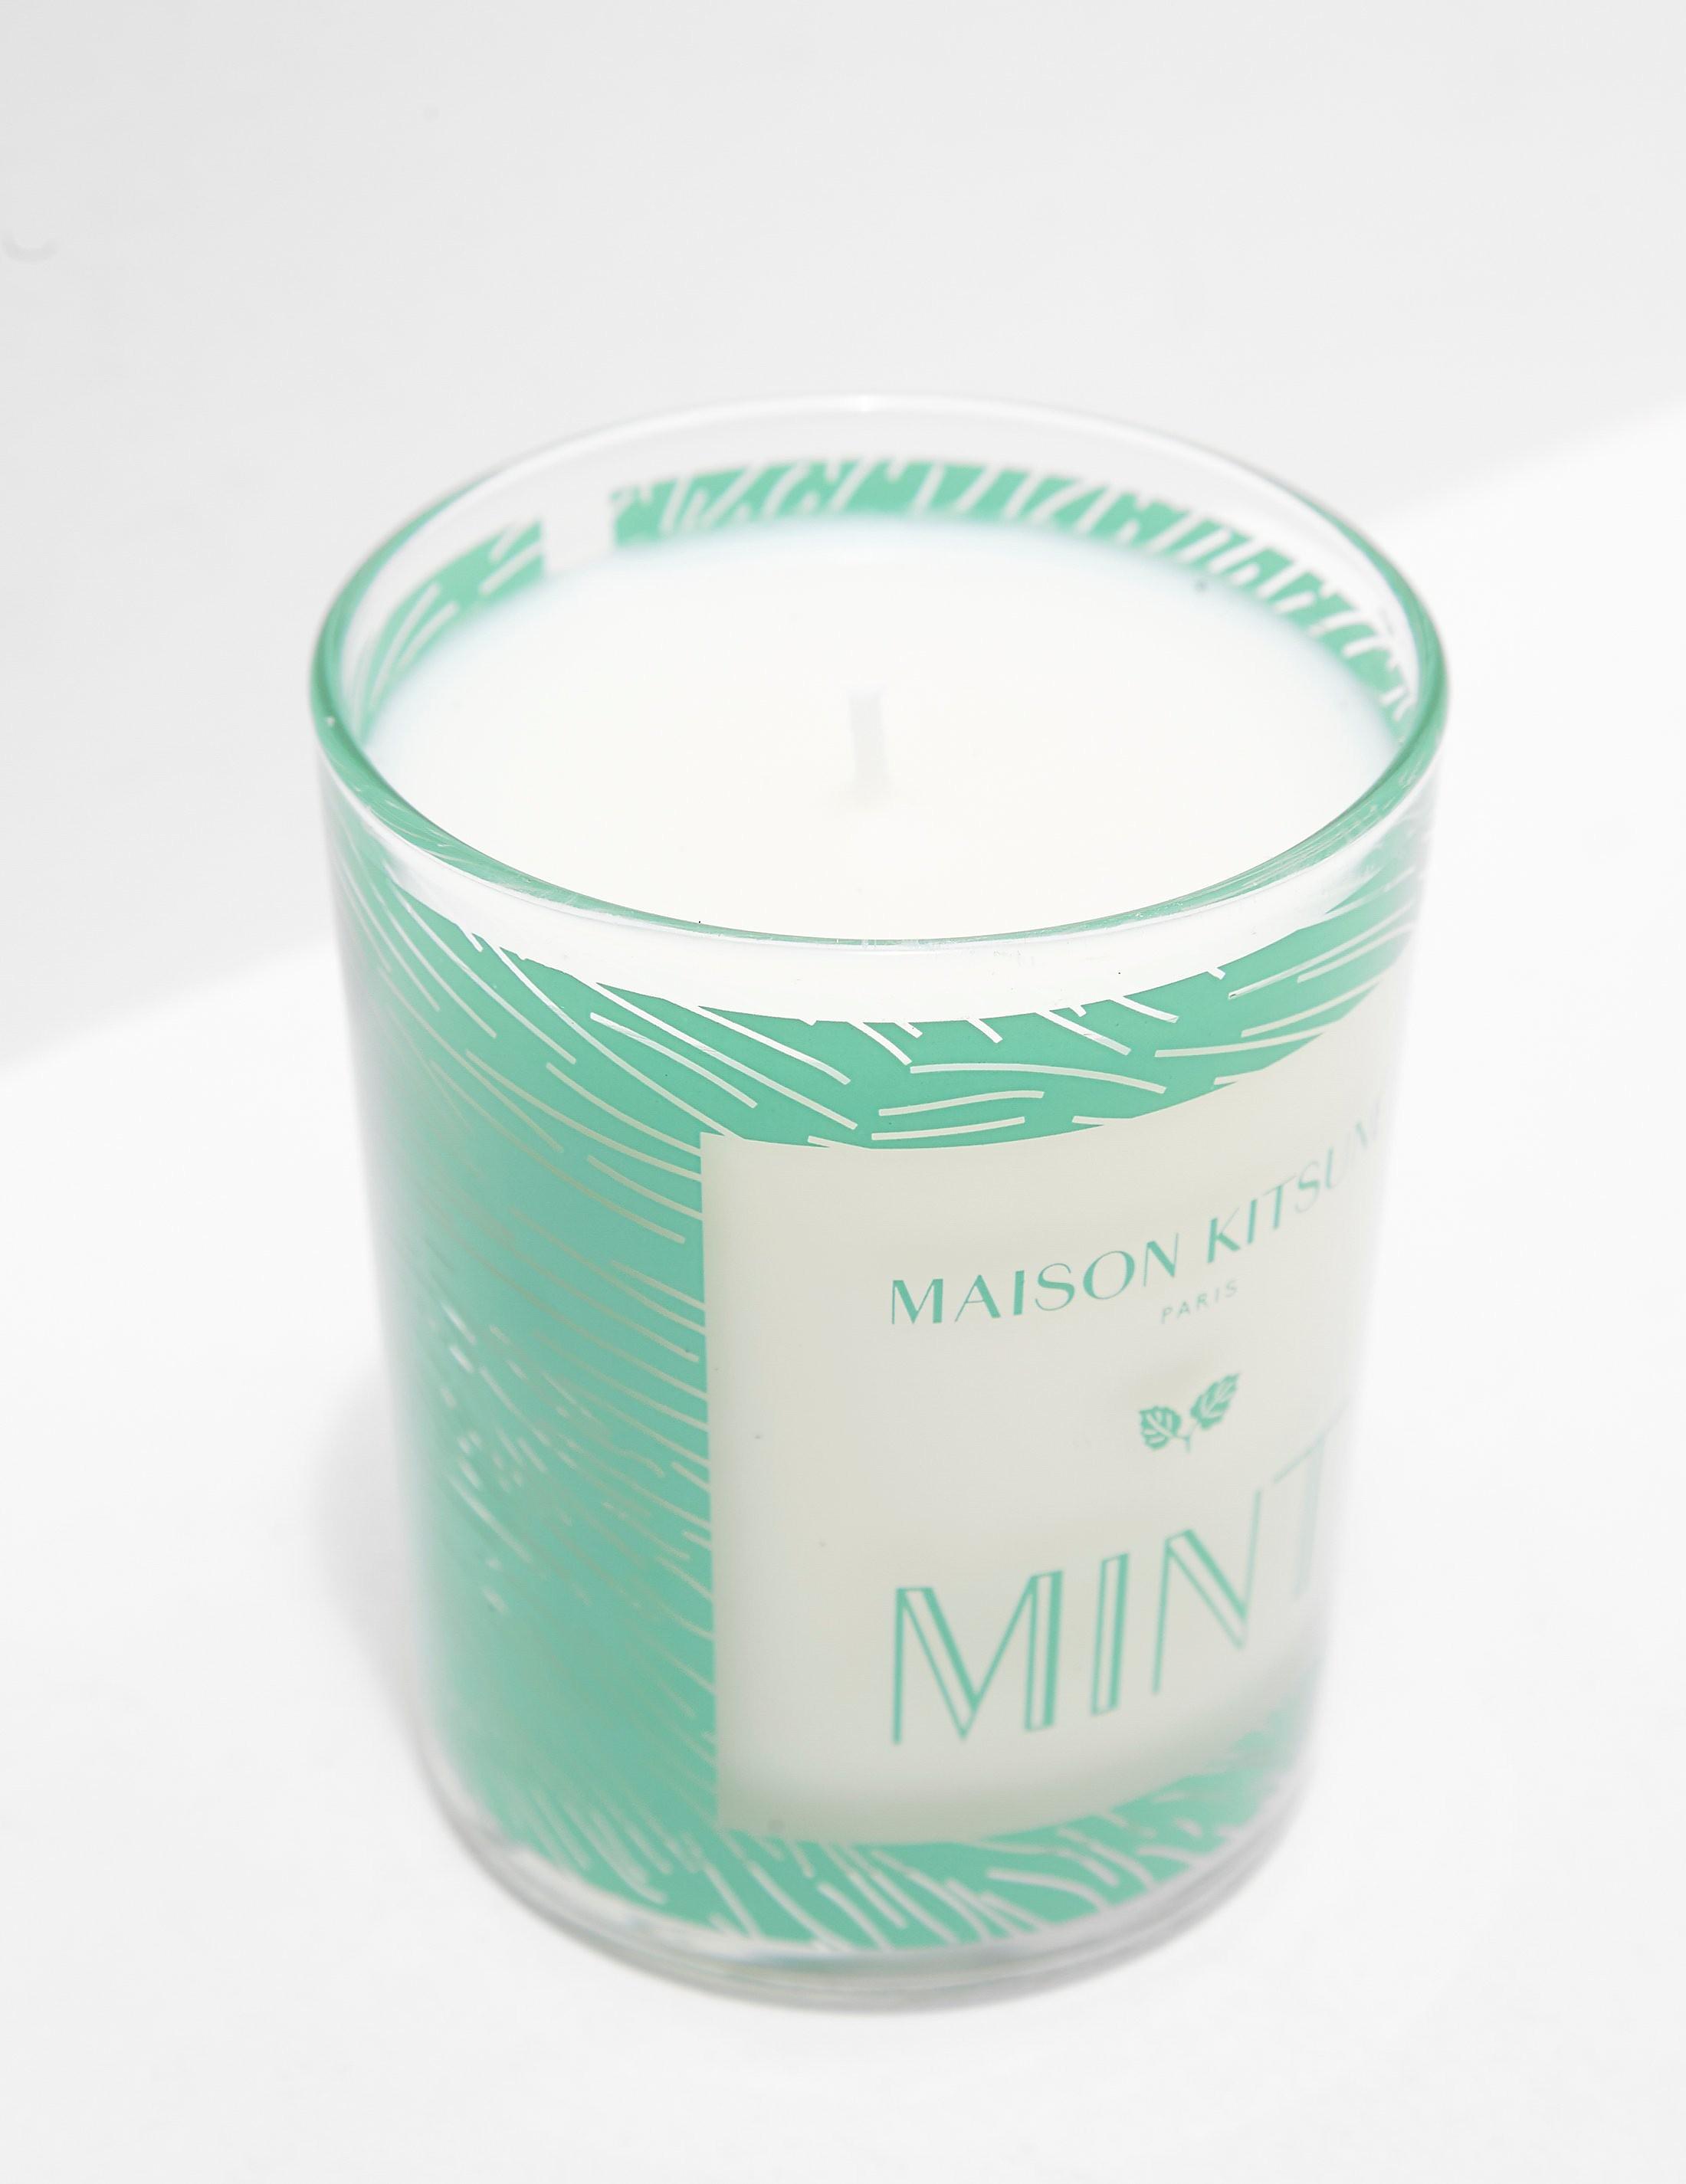 Maison Kitsune Mint Candle